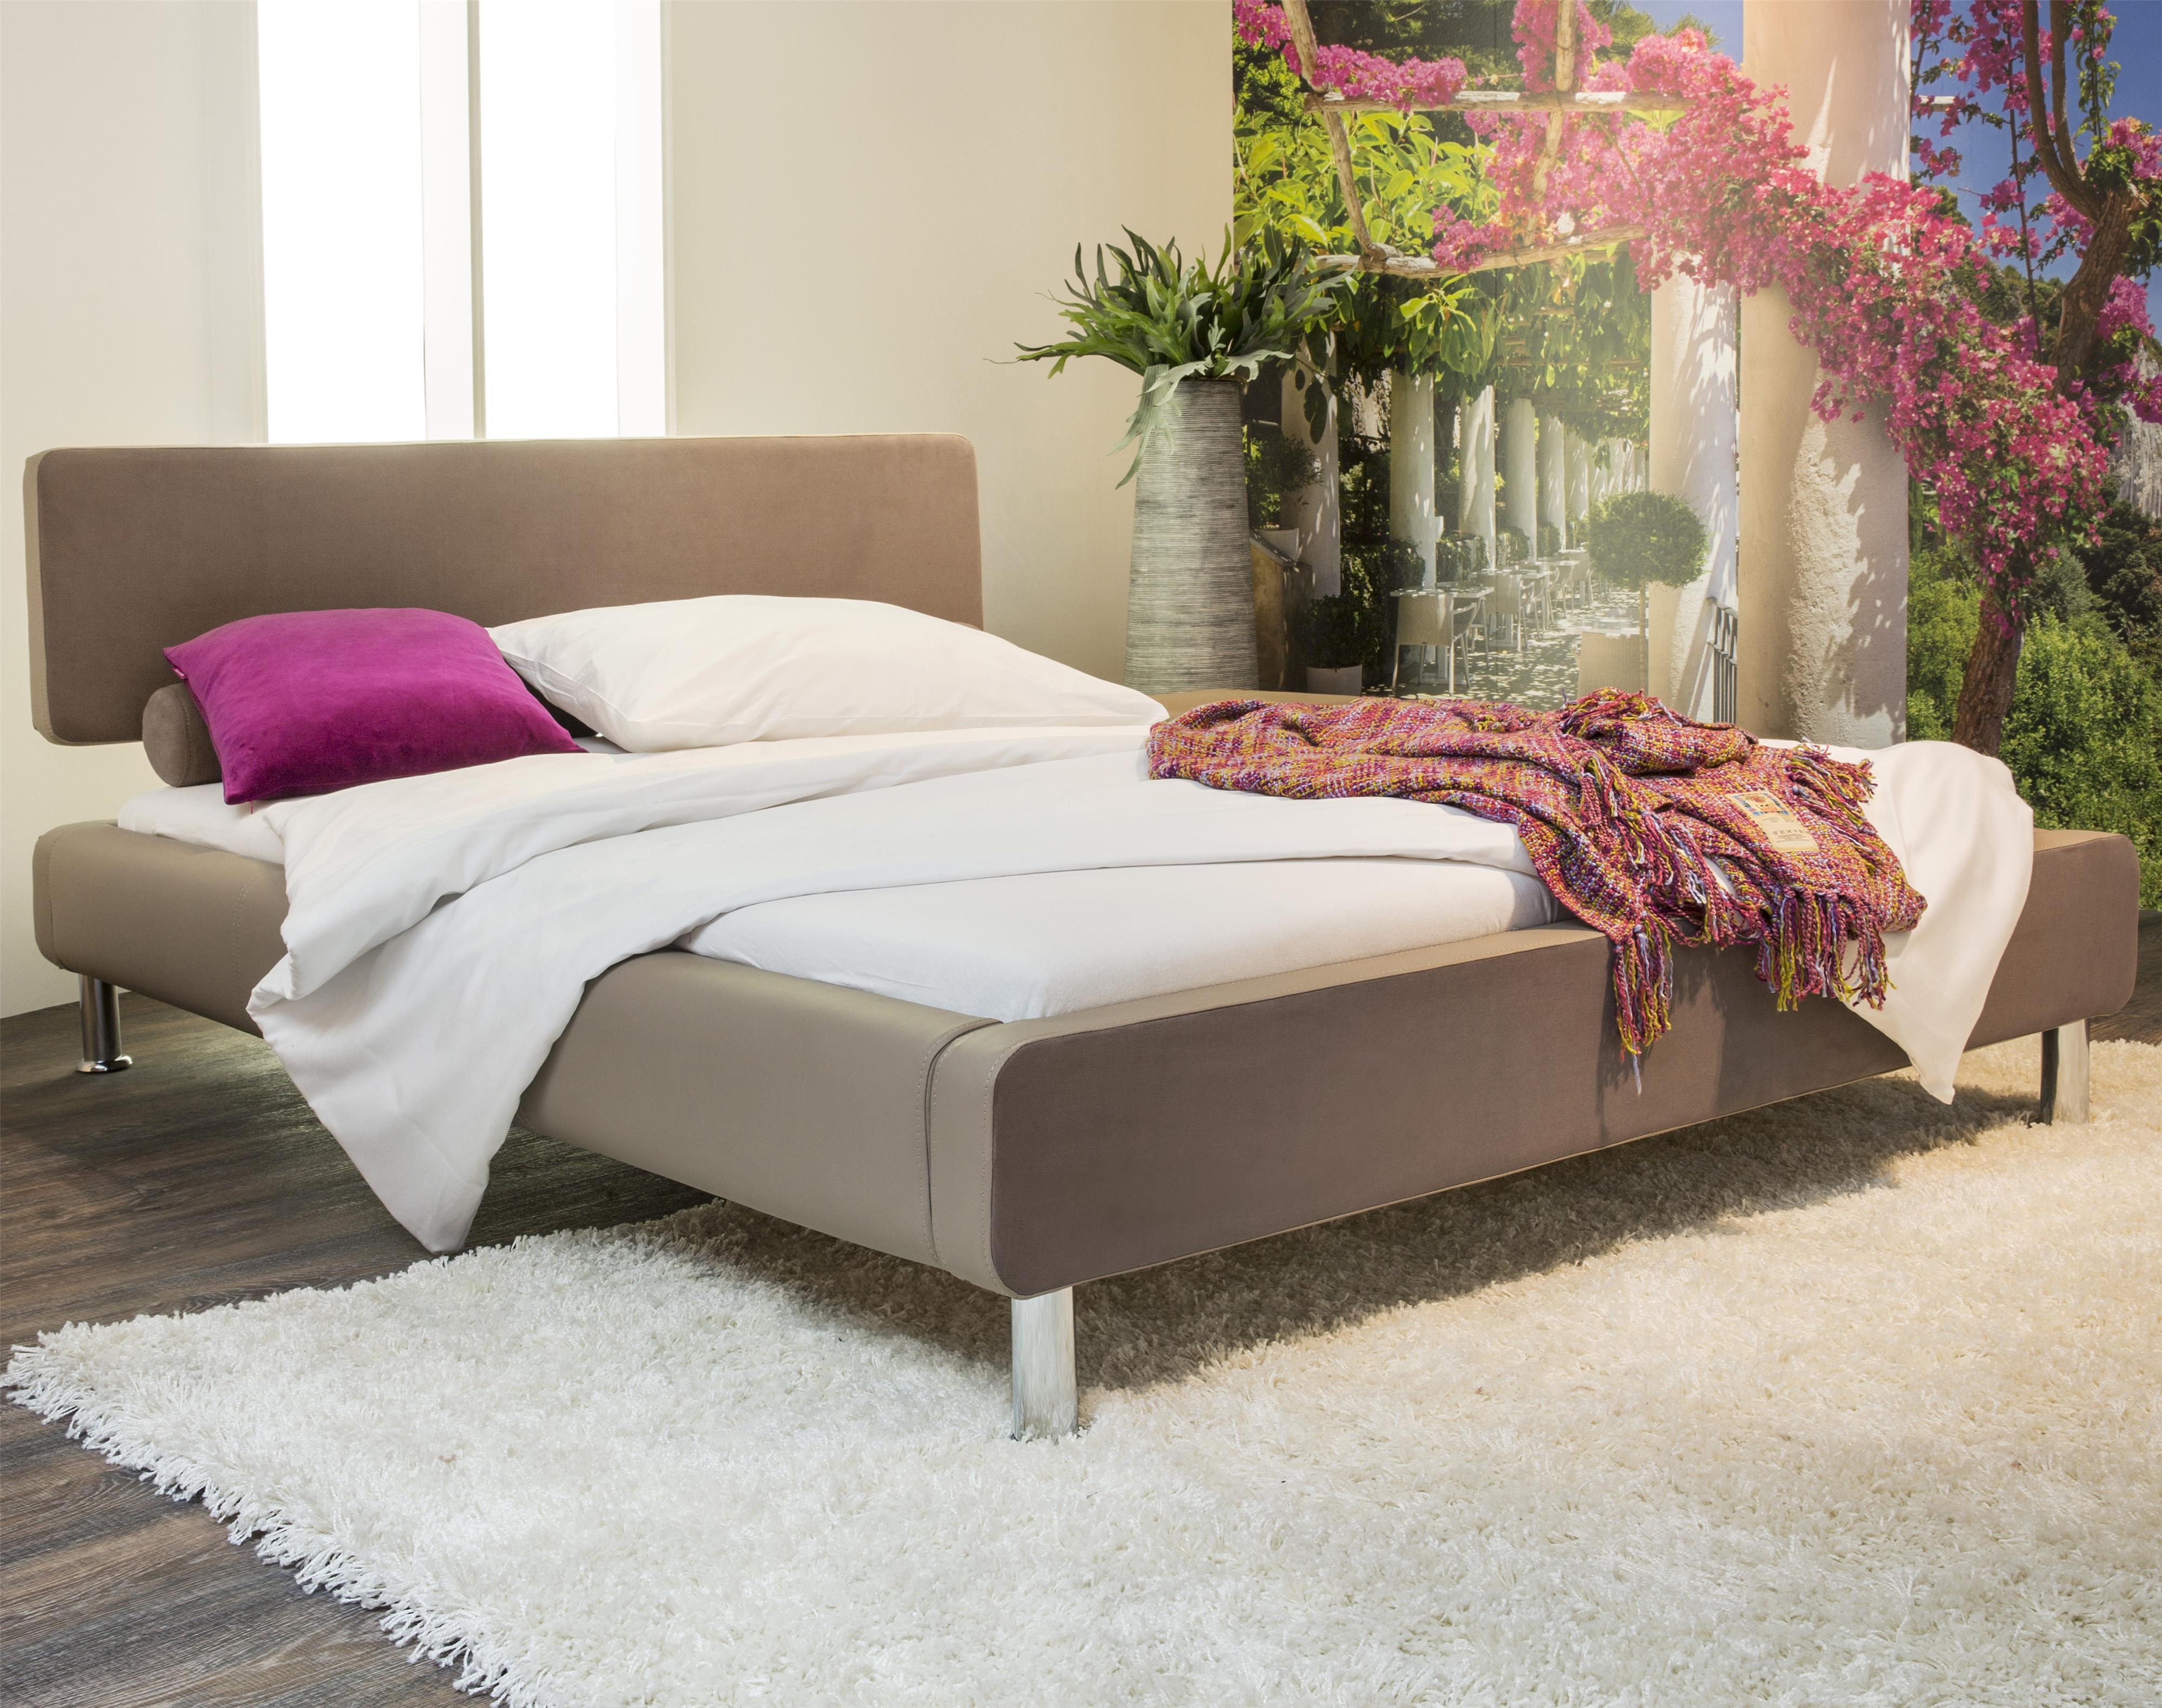 Bedroom DS (upholstered beds) by Diamond Sofa - Del Sol Furniture - Diamond Sofa Bedroom DS Dealer